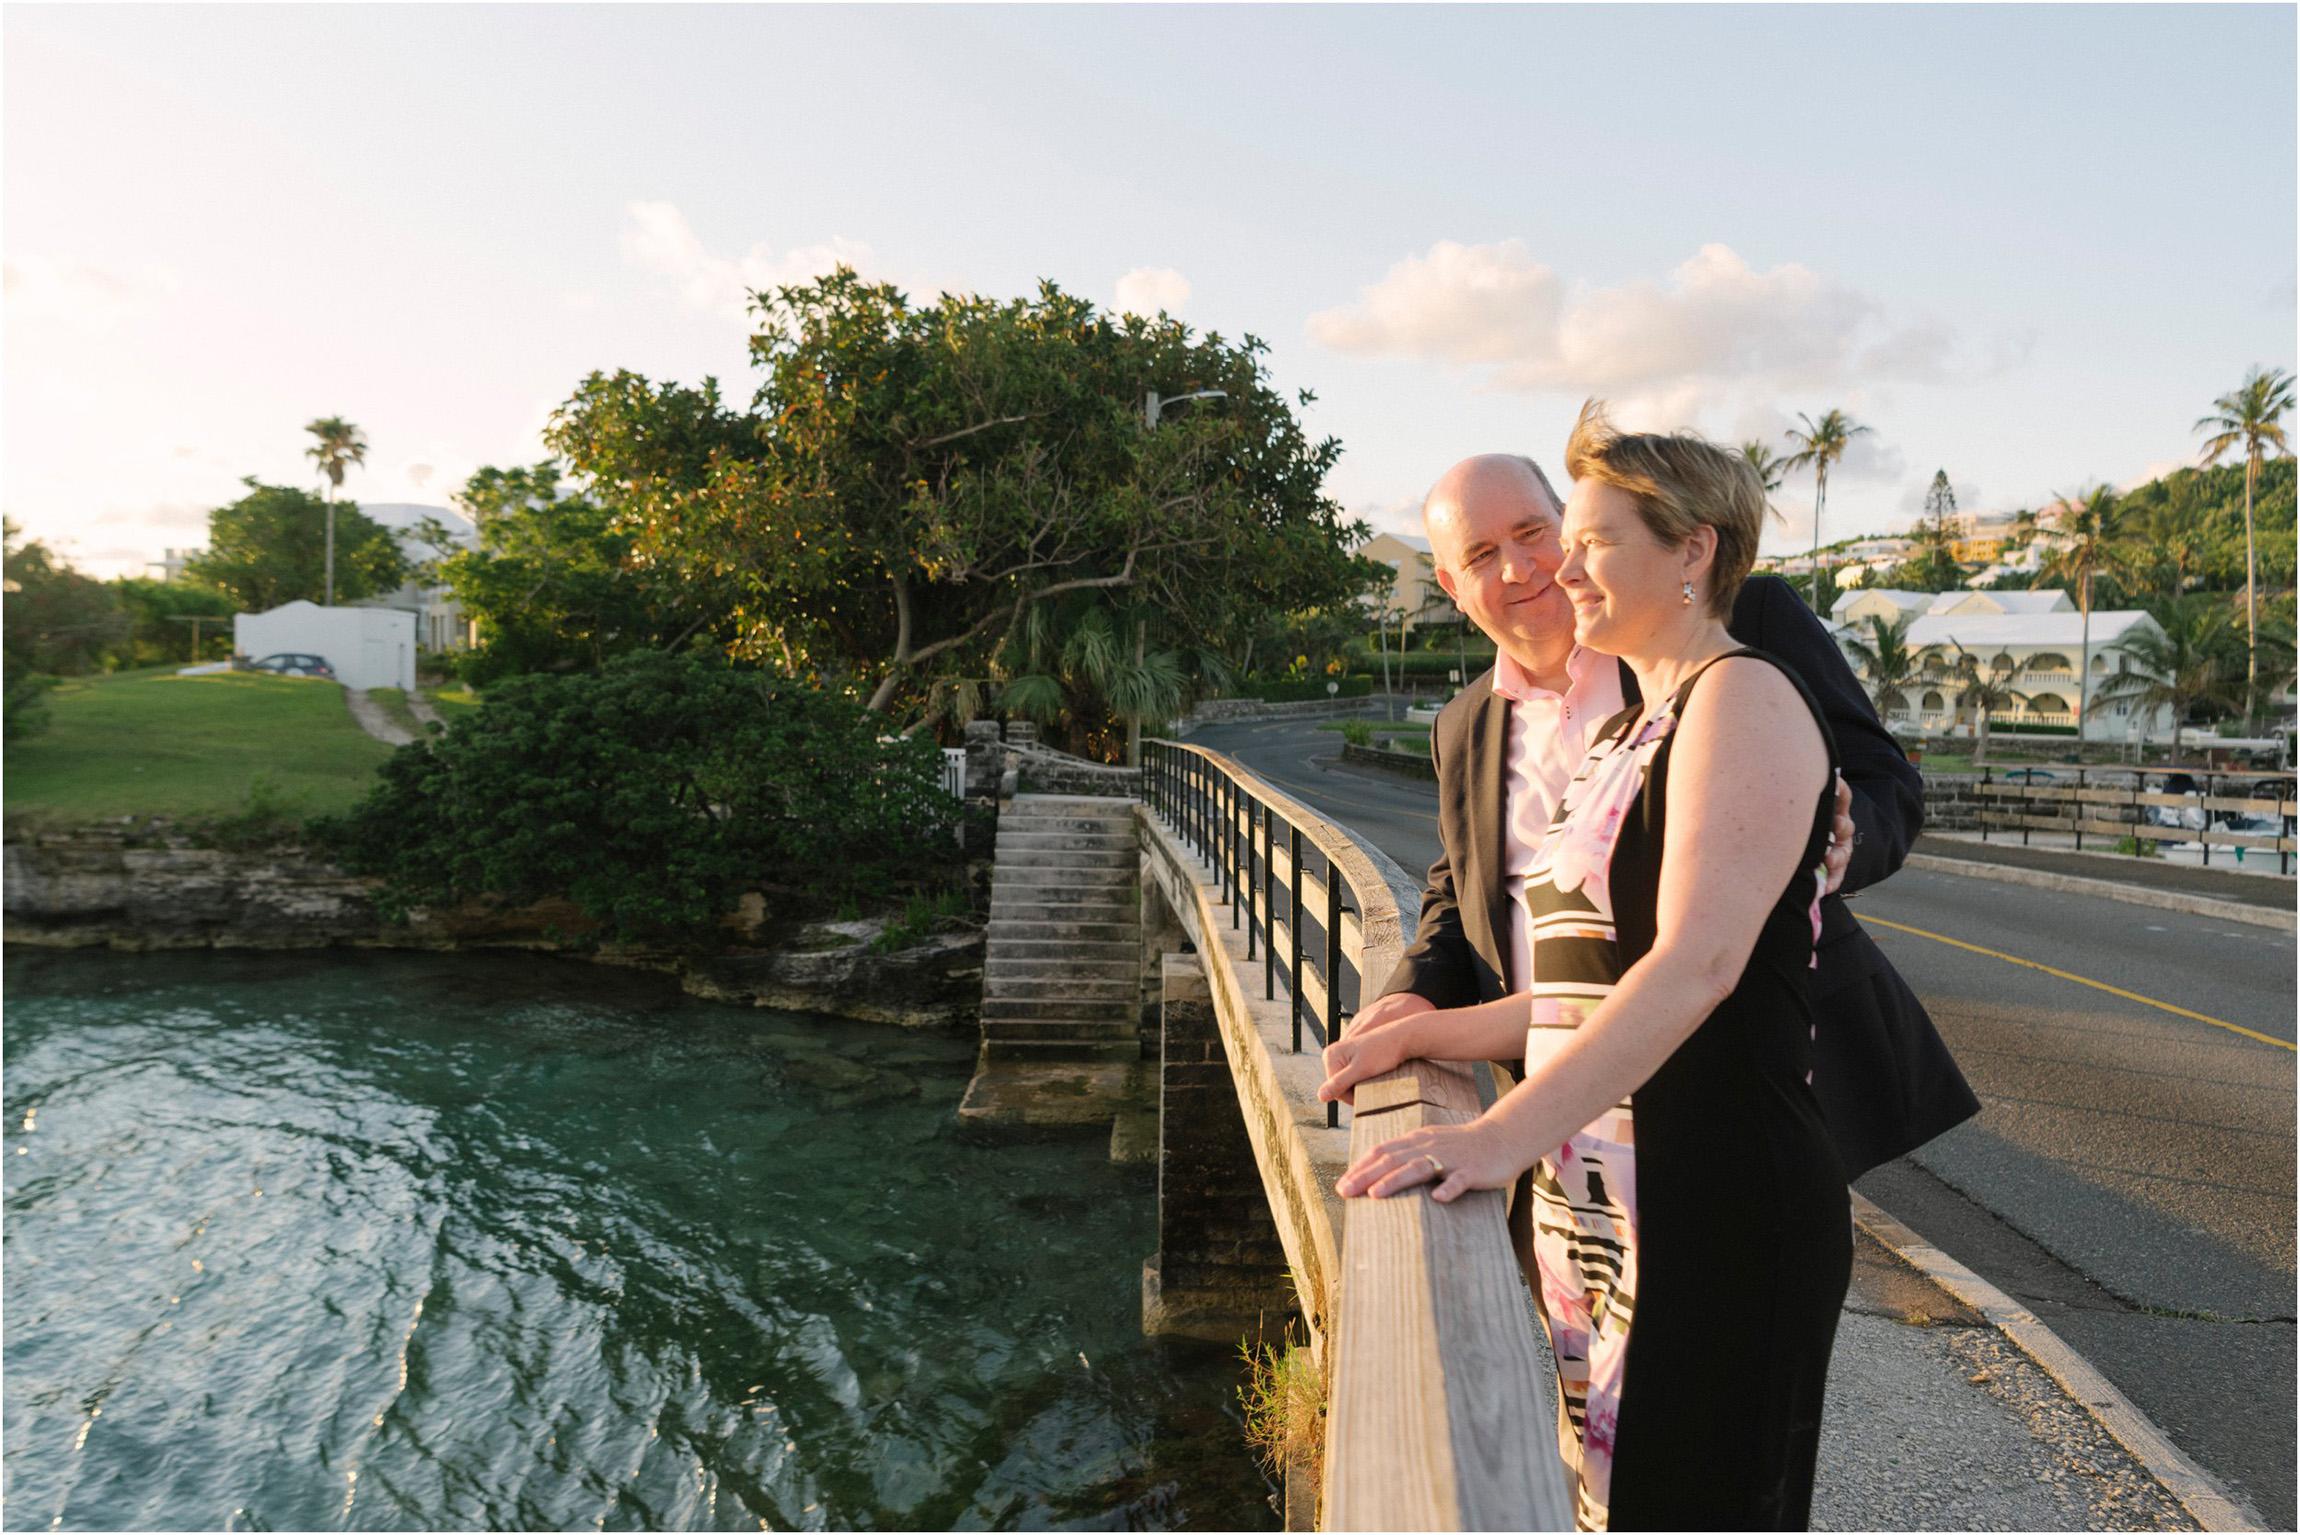 ©FianderFoto_Bermuda Photographer_Flatts Village_Cooper's Island_Andrea_004.jpg